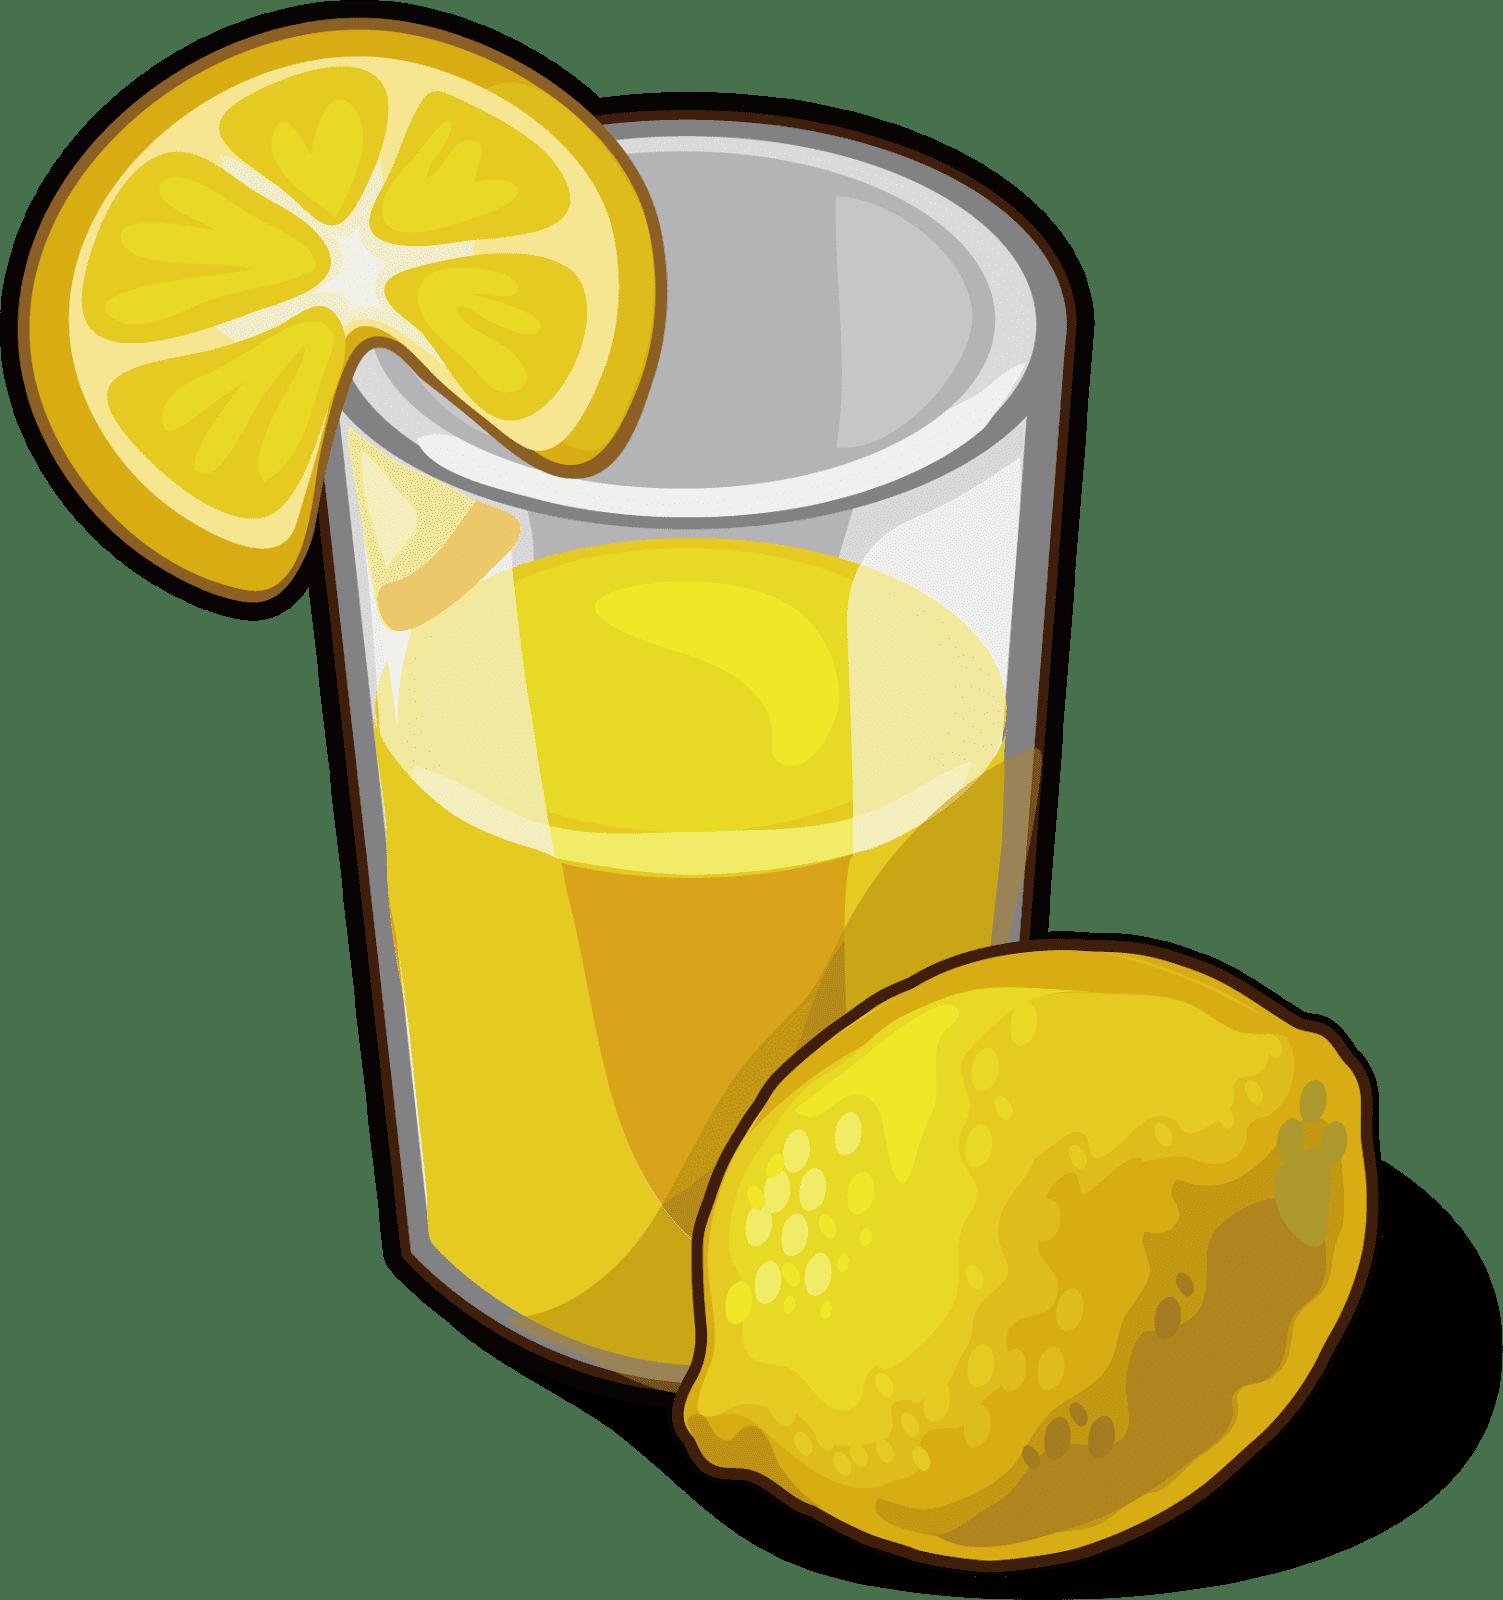 Lemon juice clipart image black and white library My Webpage image black and white library